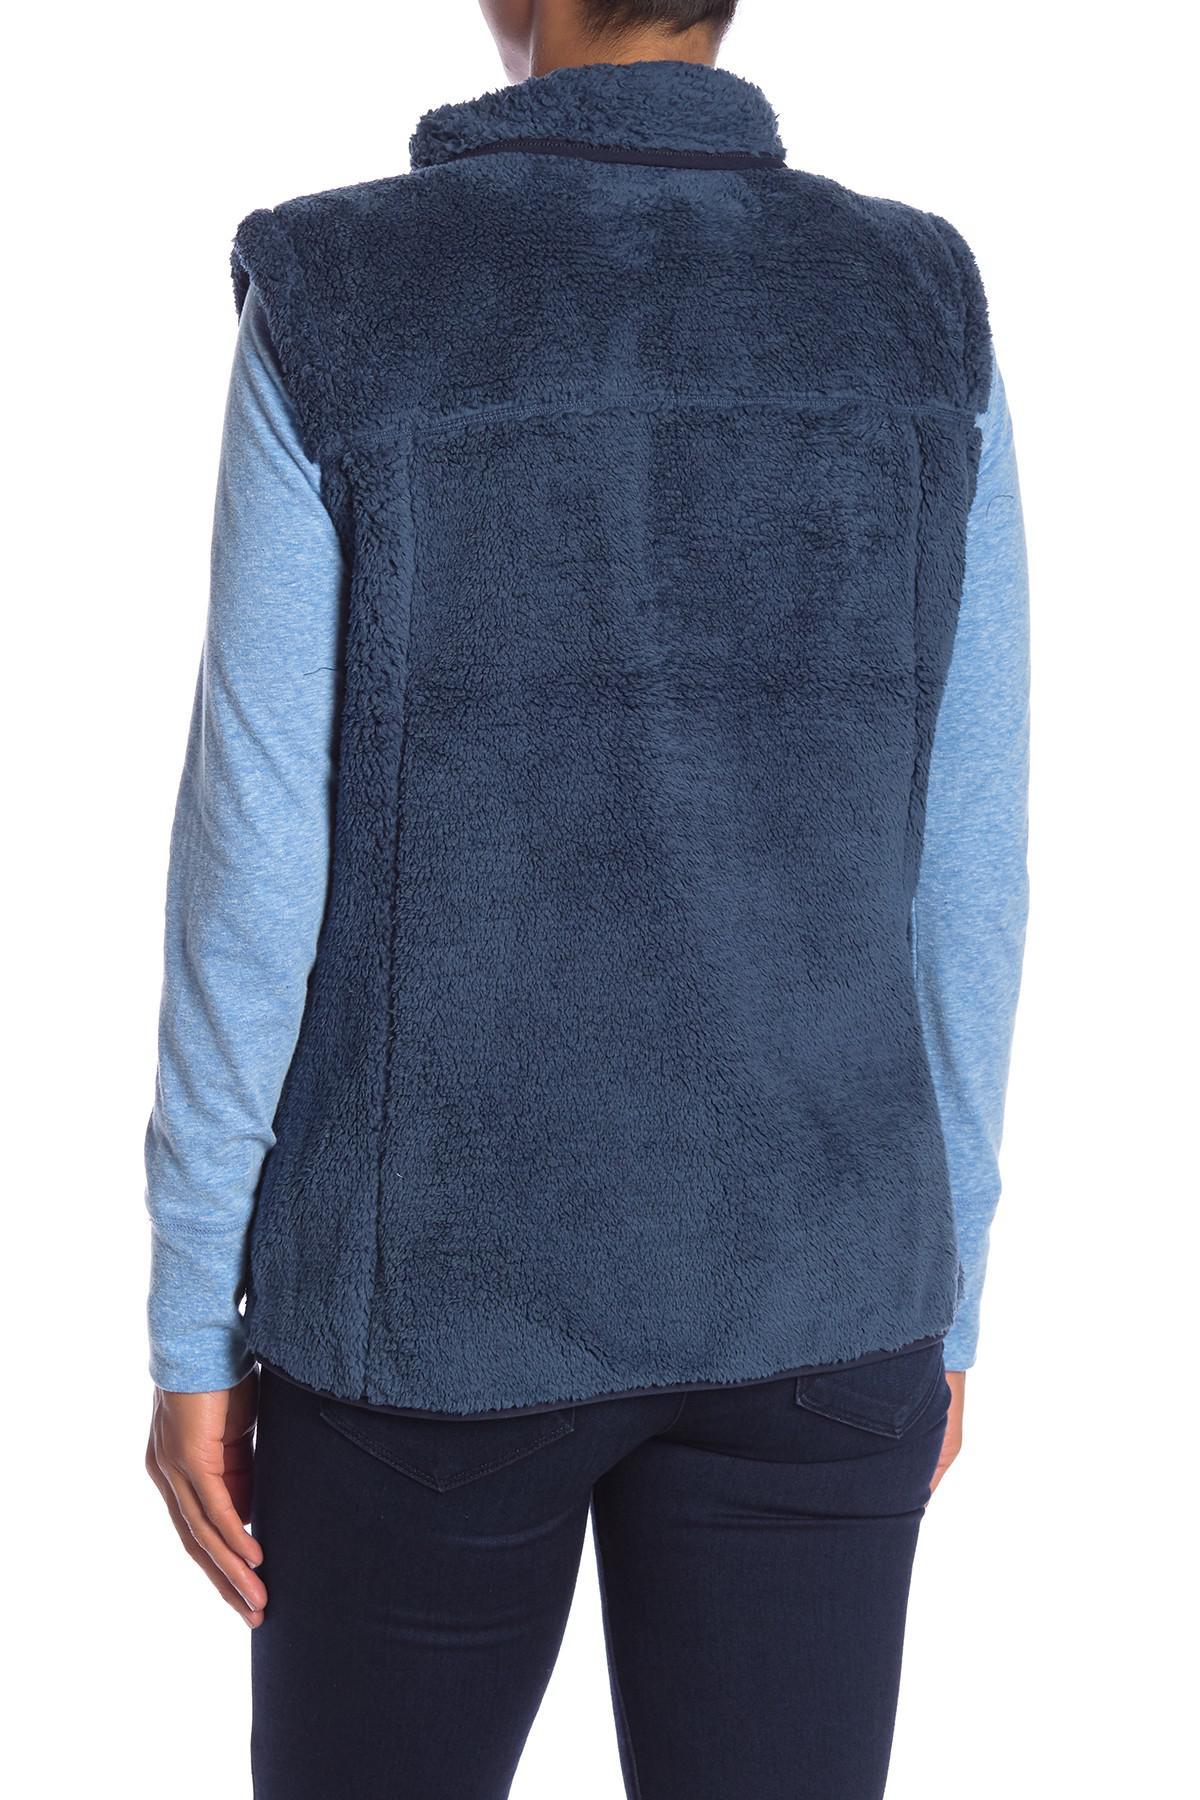 c9d8ca81aa8e Lyst - The North Face Campshire Vest (peyote Beige) Women s Vest in Blue